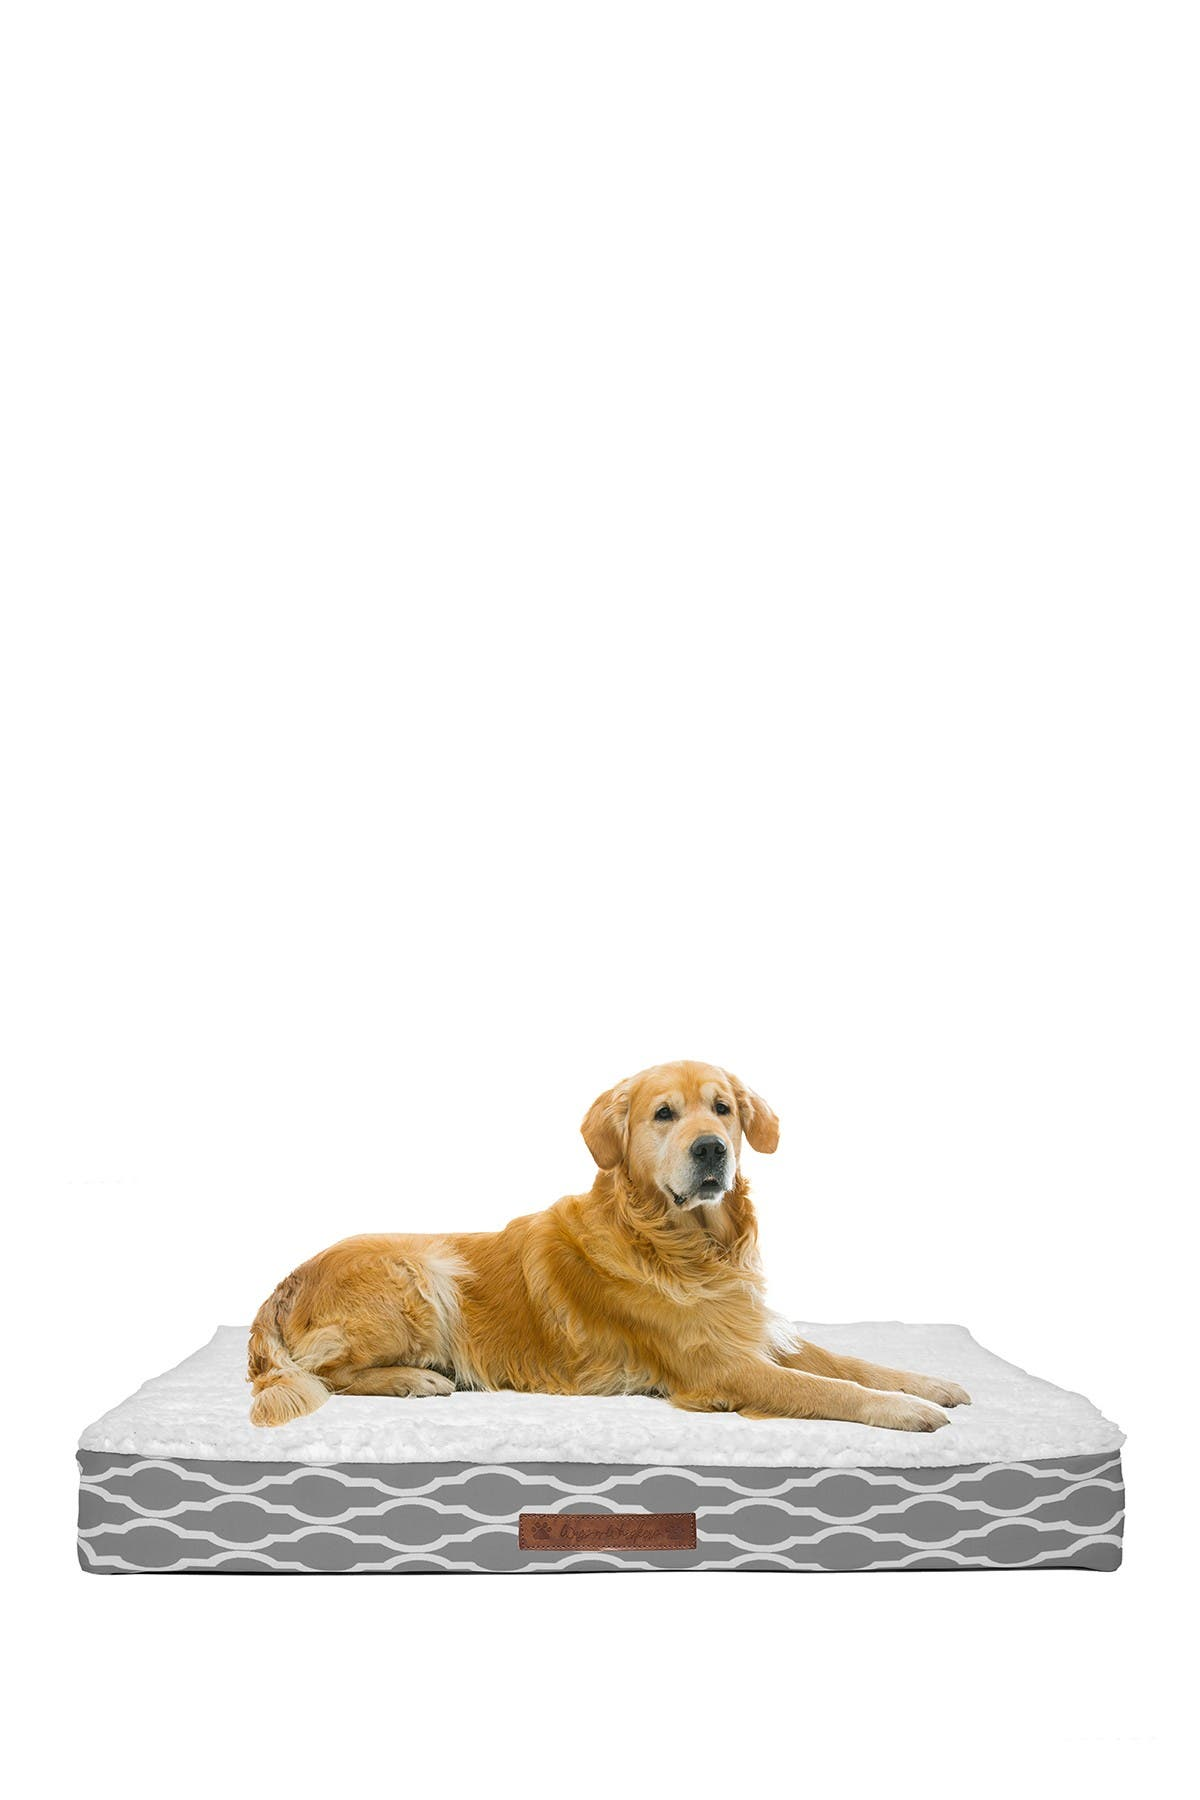 Image of Duck River Textile Trieste Narrow Trellis Jumbo Orthopedic Memory Foam Pet Bed